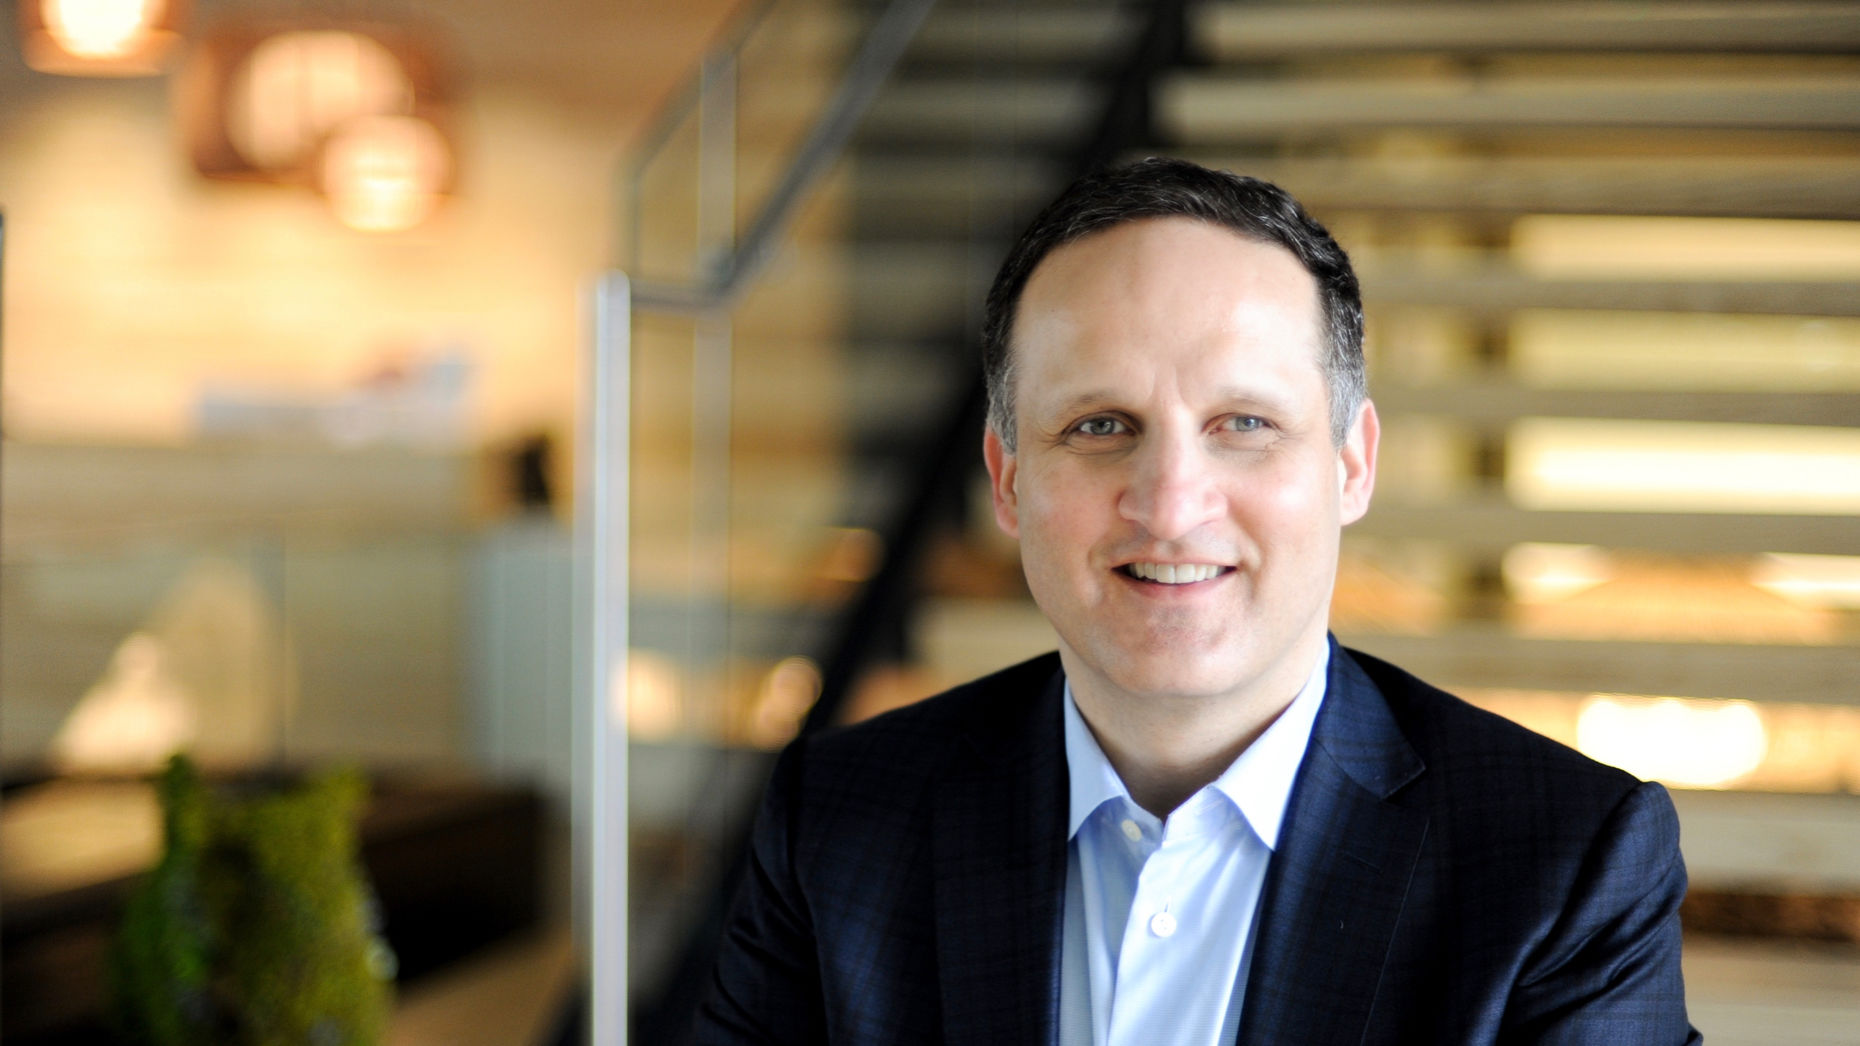 Tableau CEO Adam Selipsky. Photo by Tableau